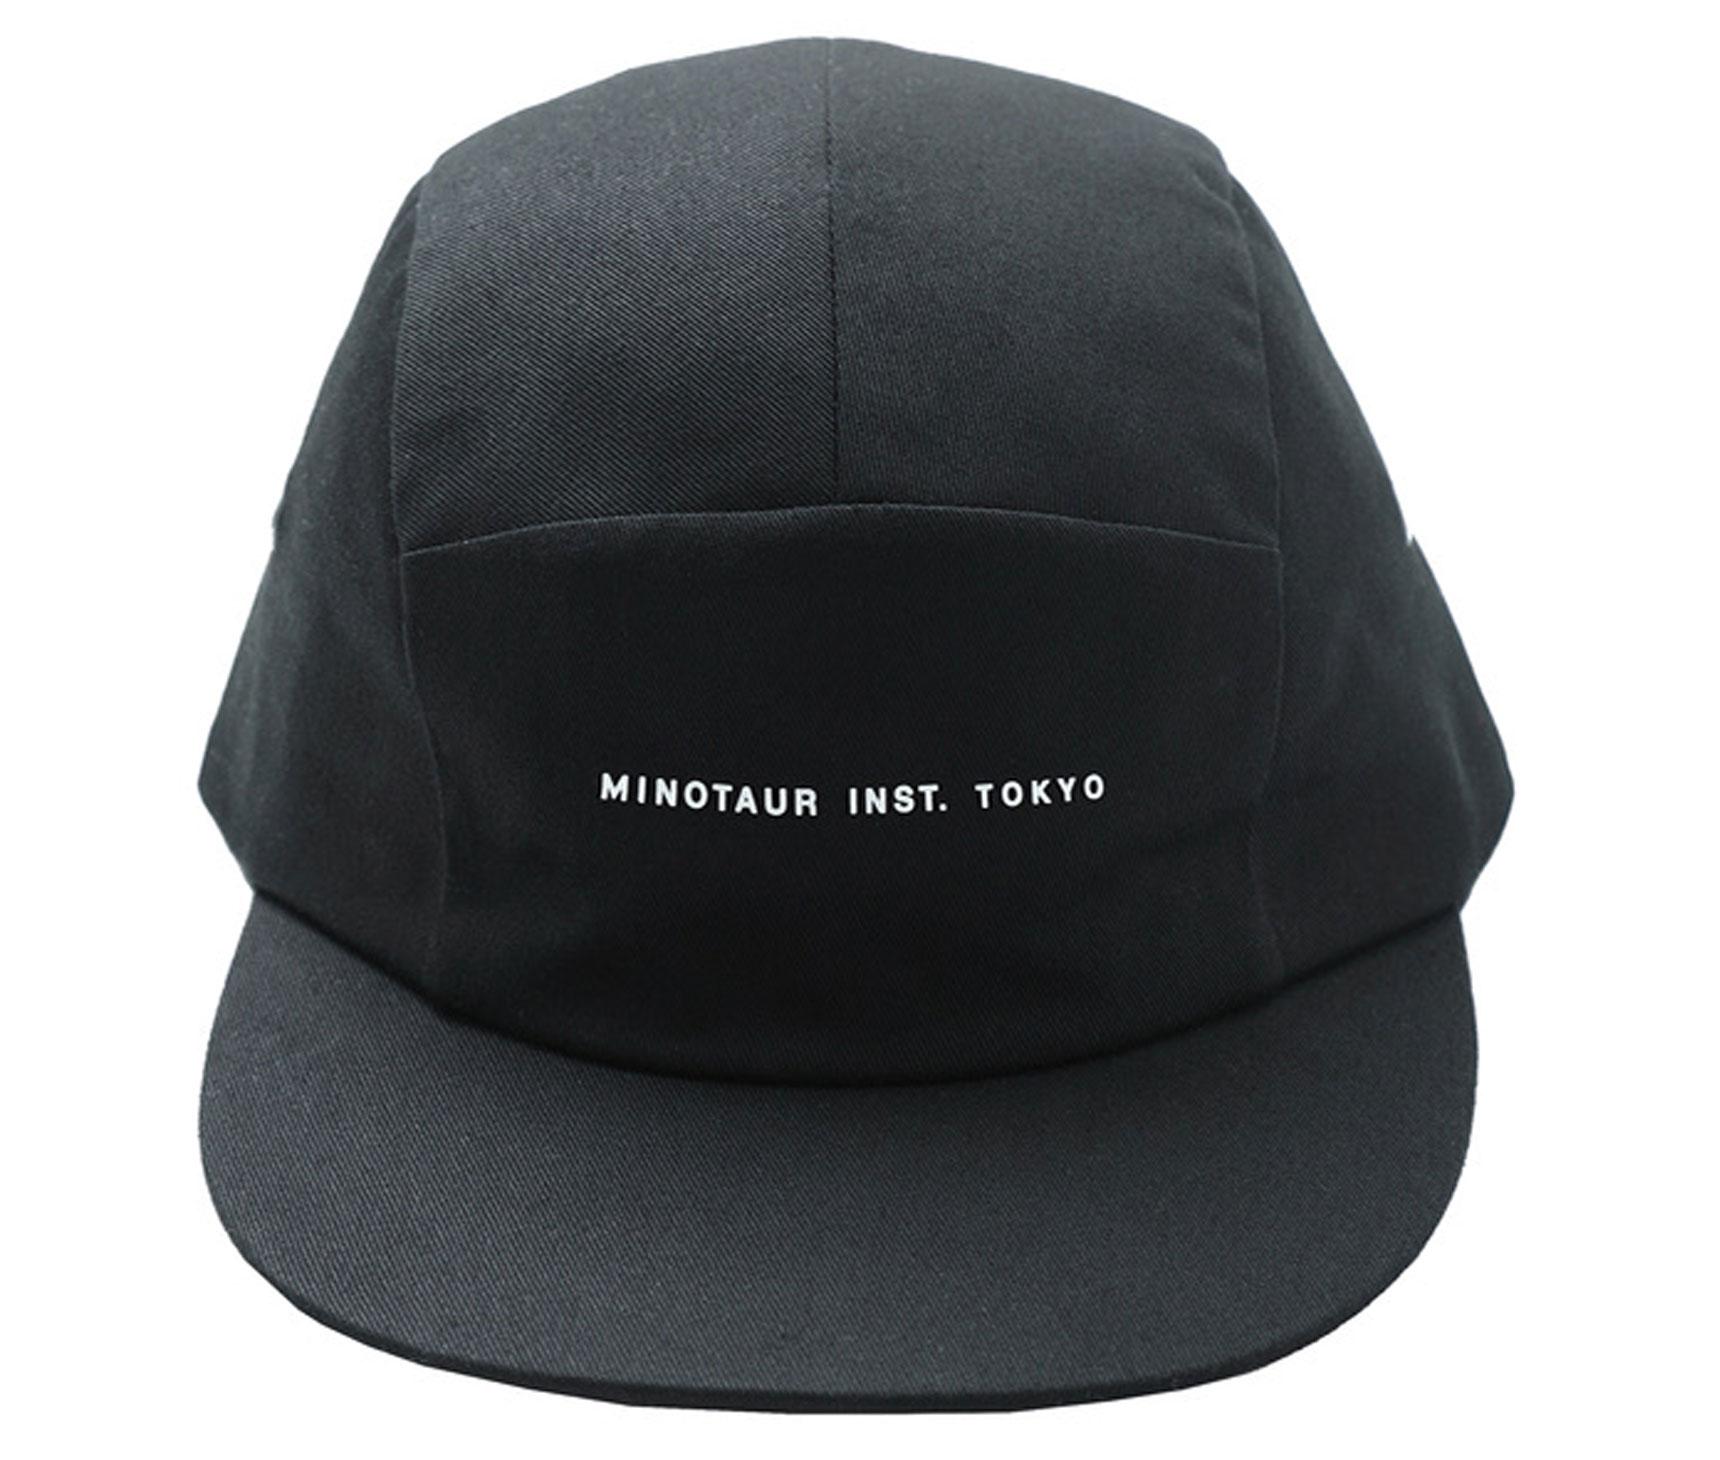 MXP x MINOTAUR INST.